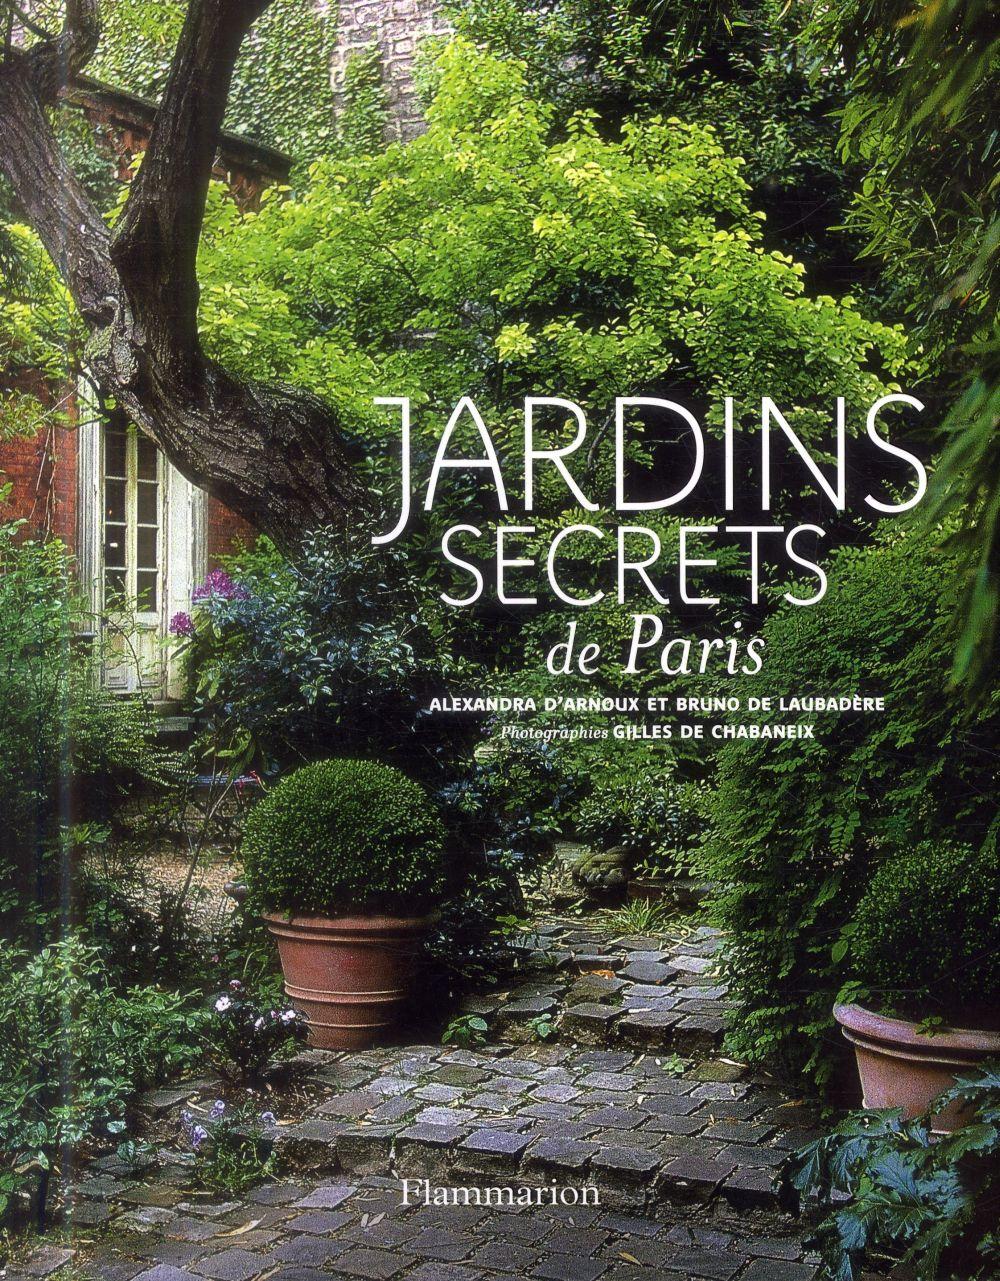 Jardins secrets de Paris